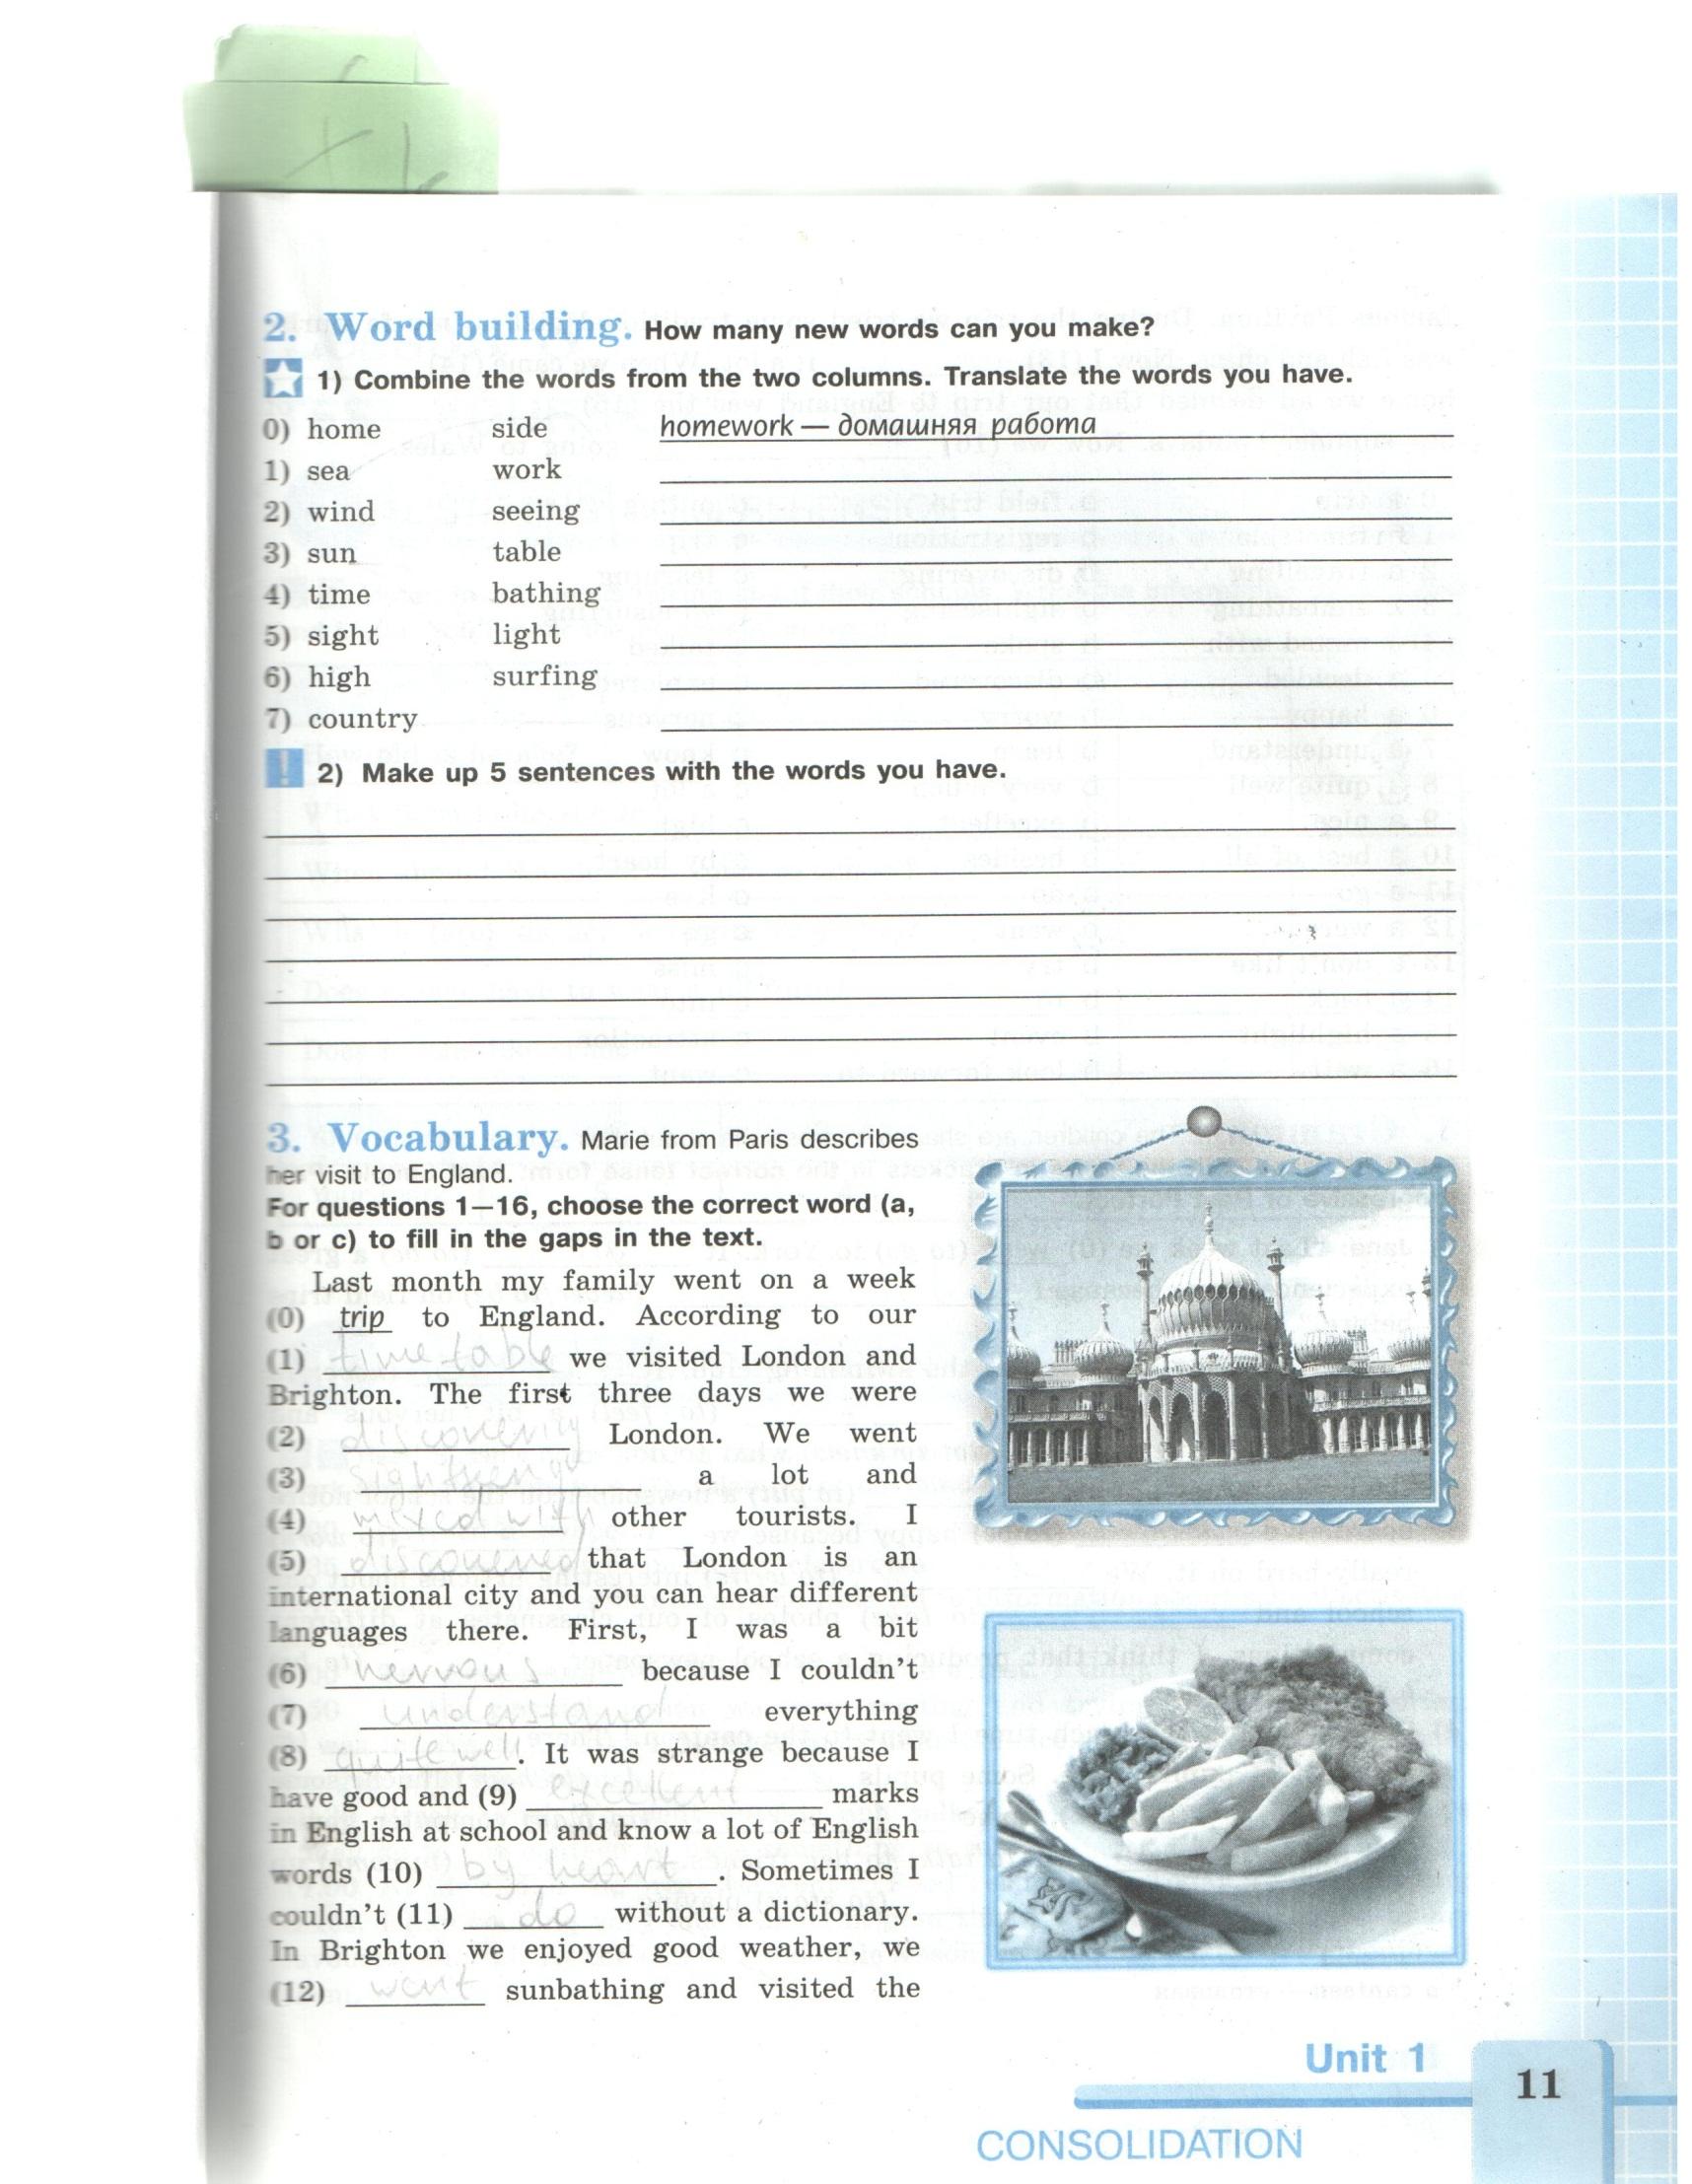 C:\Users\Грузиновская СОШ\Documents\Scanned Documents\Рисунок (2085).jpg